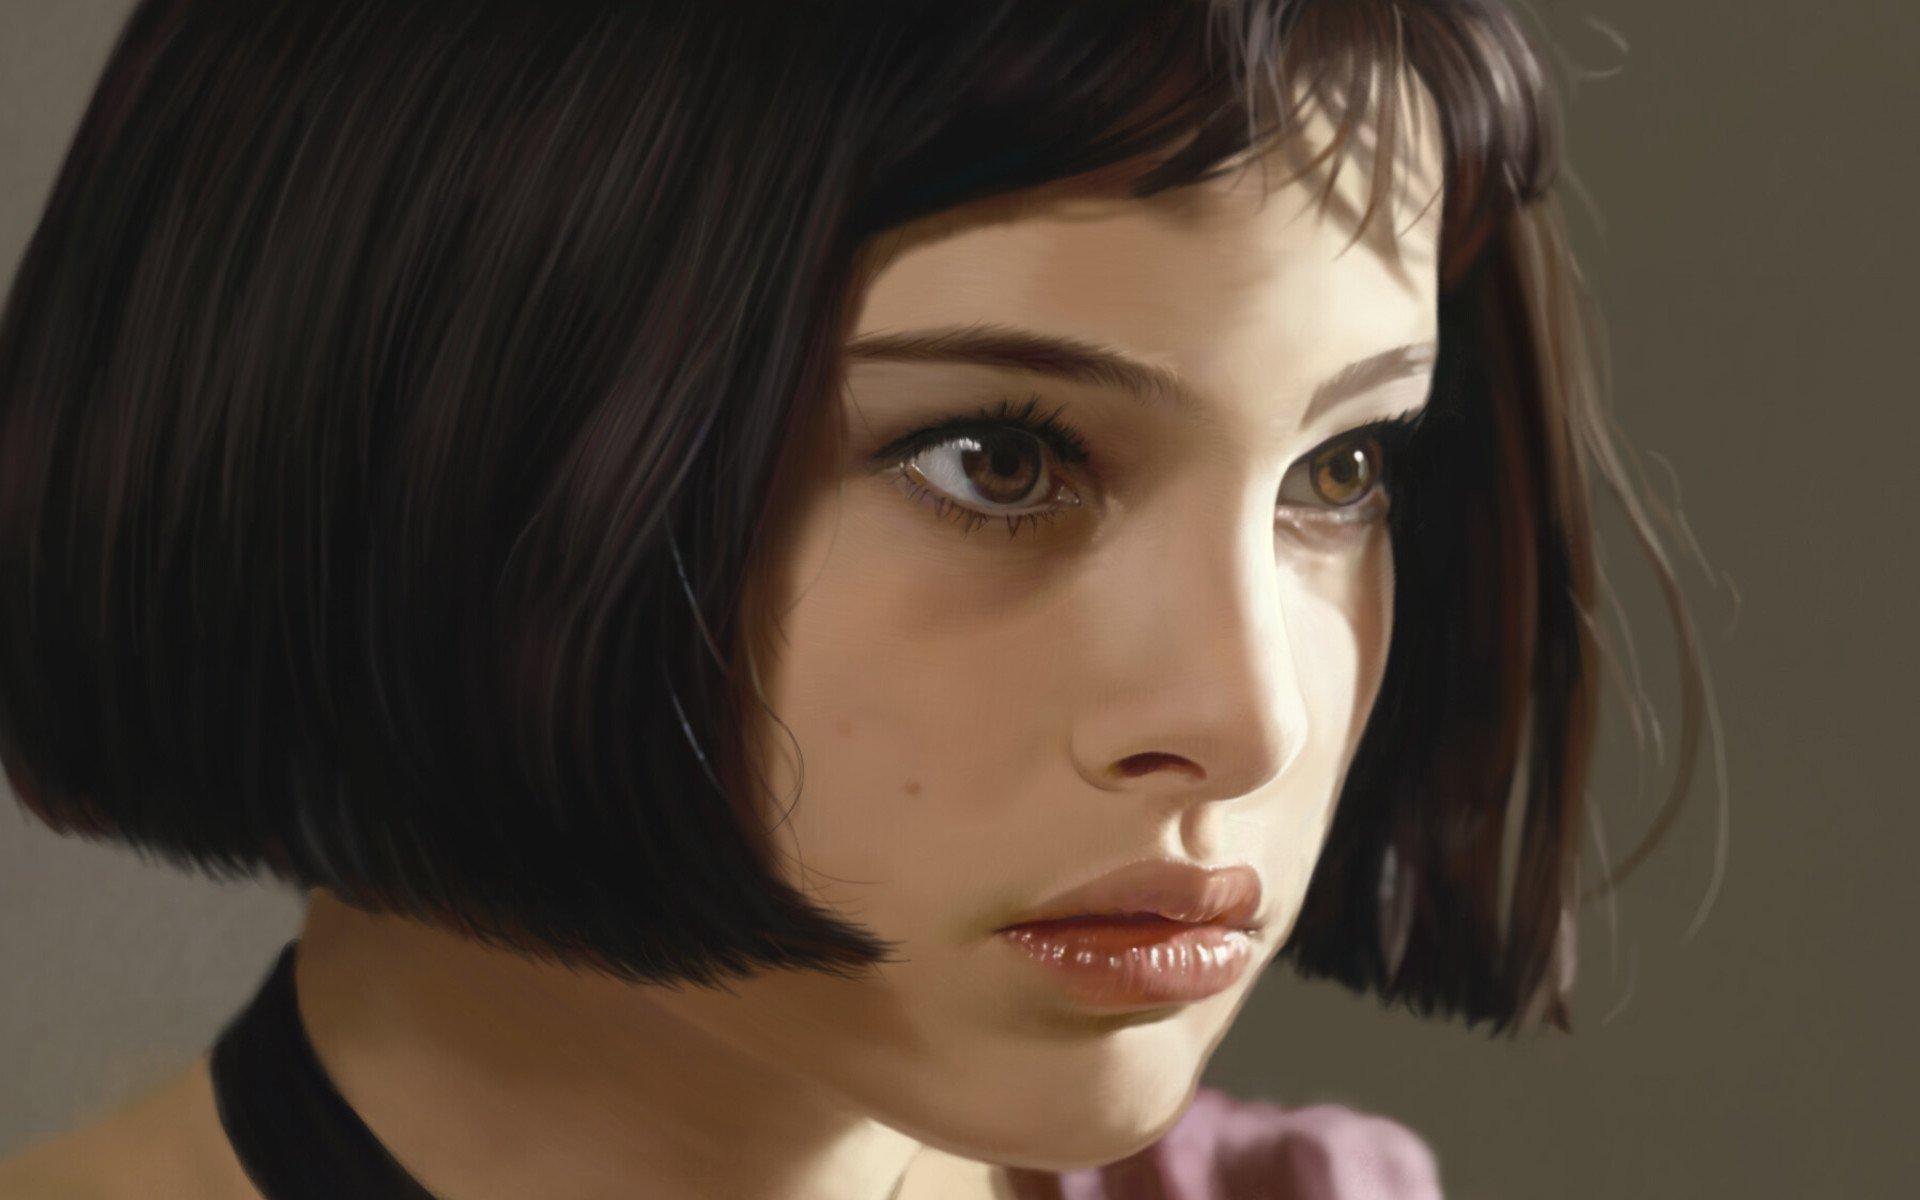 Artwork Women Natalie Portman Leon The Professional Short Hair Face 1920x1200